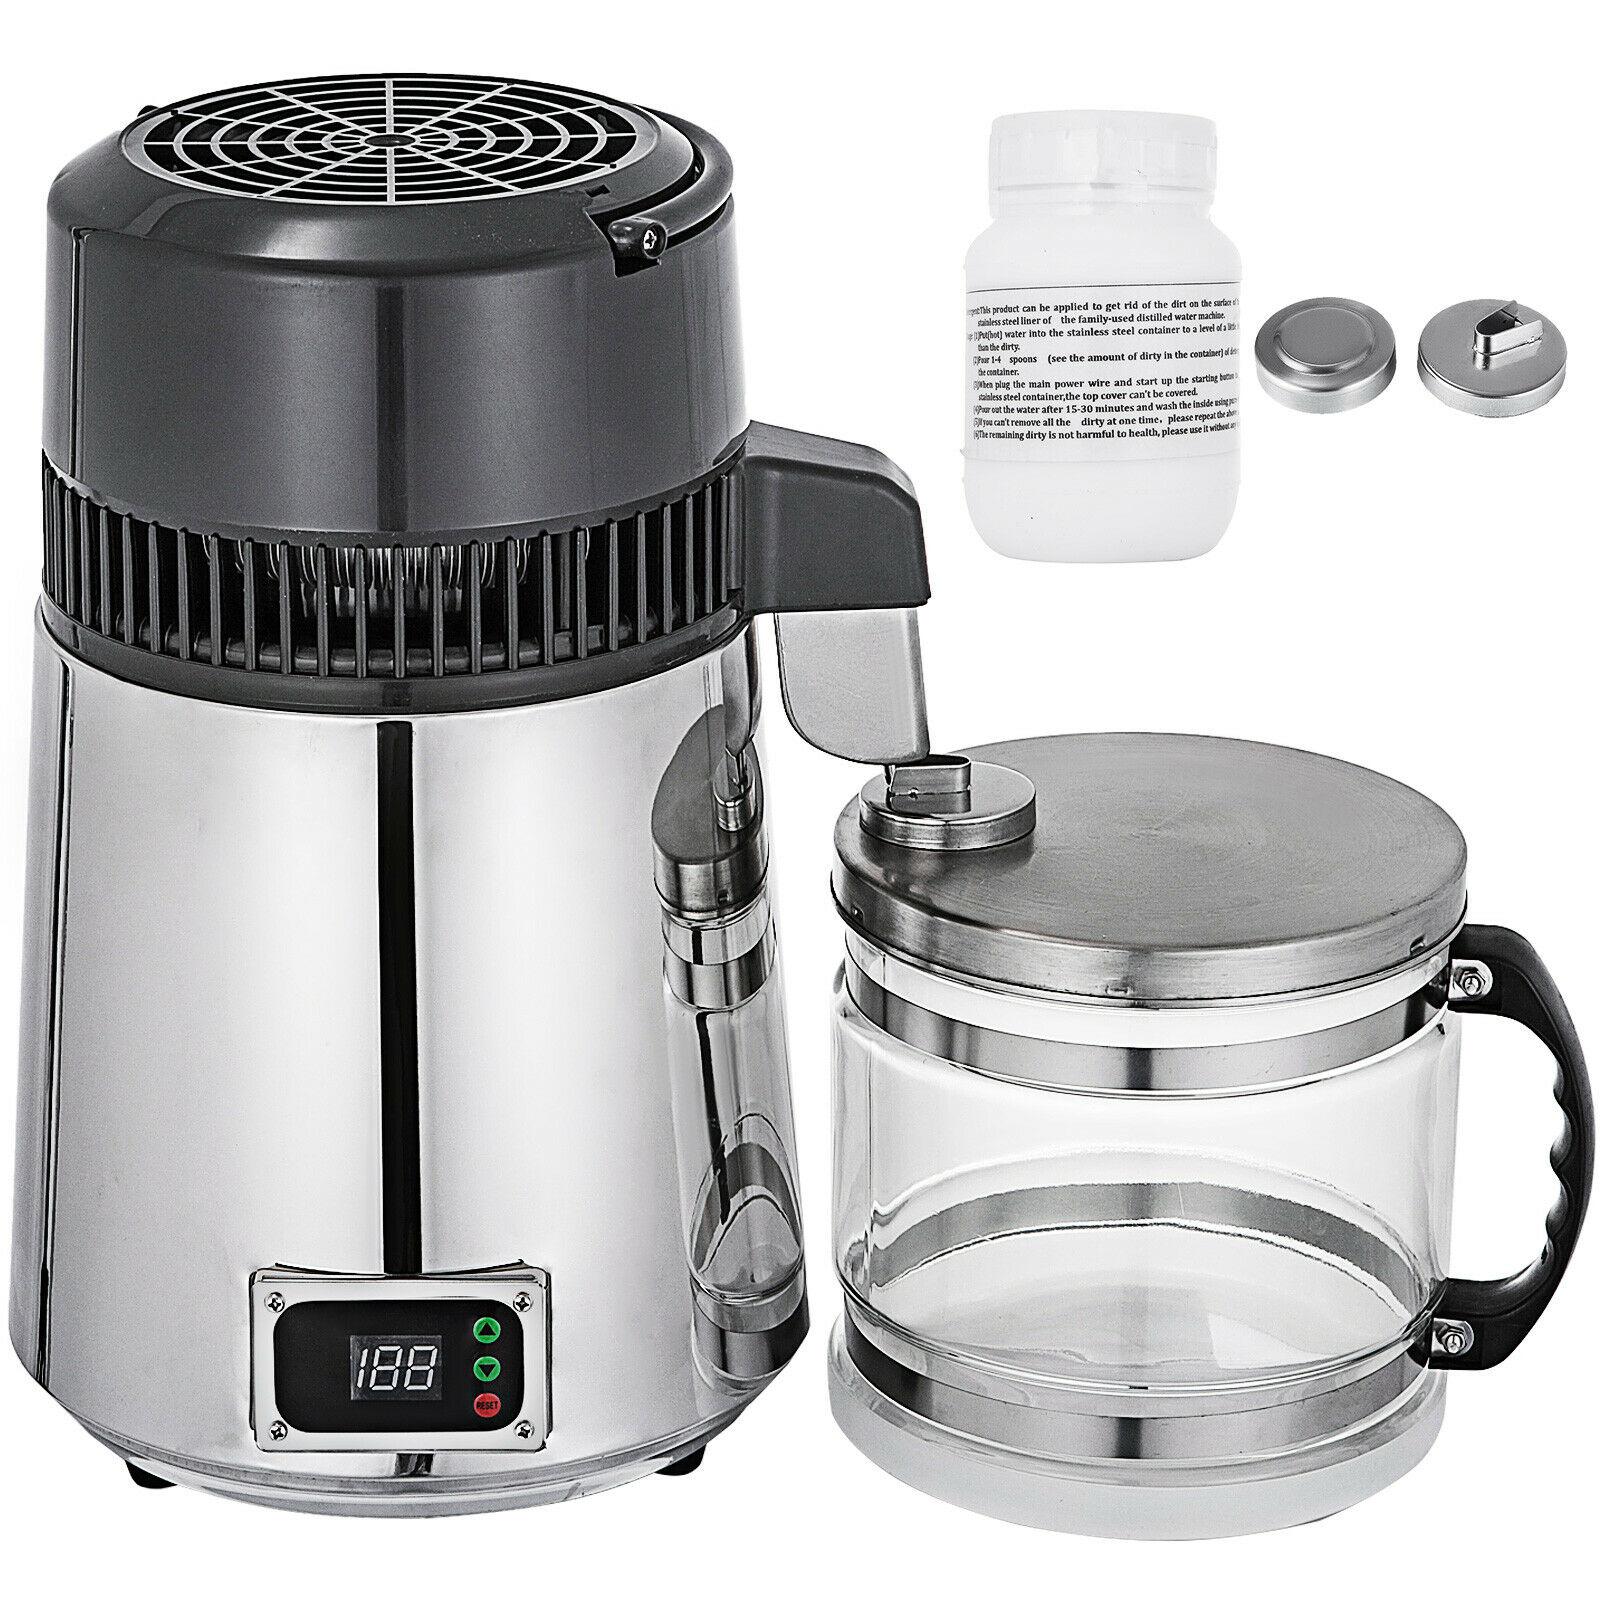 Envío Gratis, destilador de agua pura, purificador de agua 4L, filtro de agua, encimera de acero inoxidable